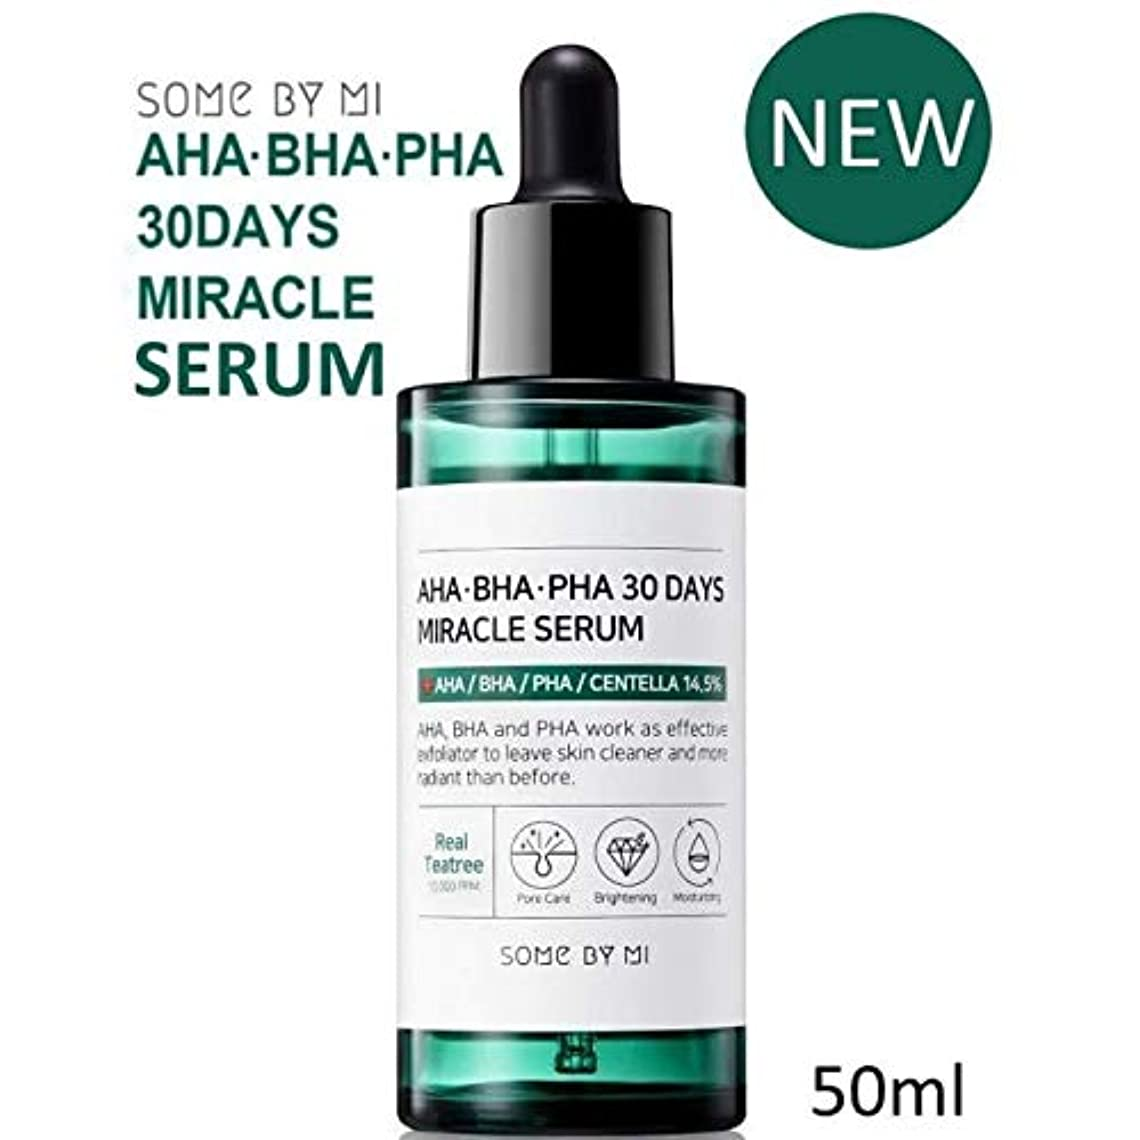 [Somebymi] AHA BHA PHA 30Days Miracle Serum 50ml/Korea Cosmetic